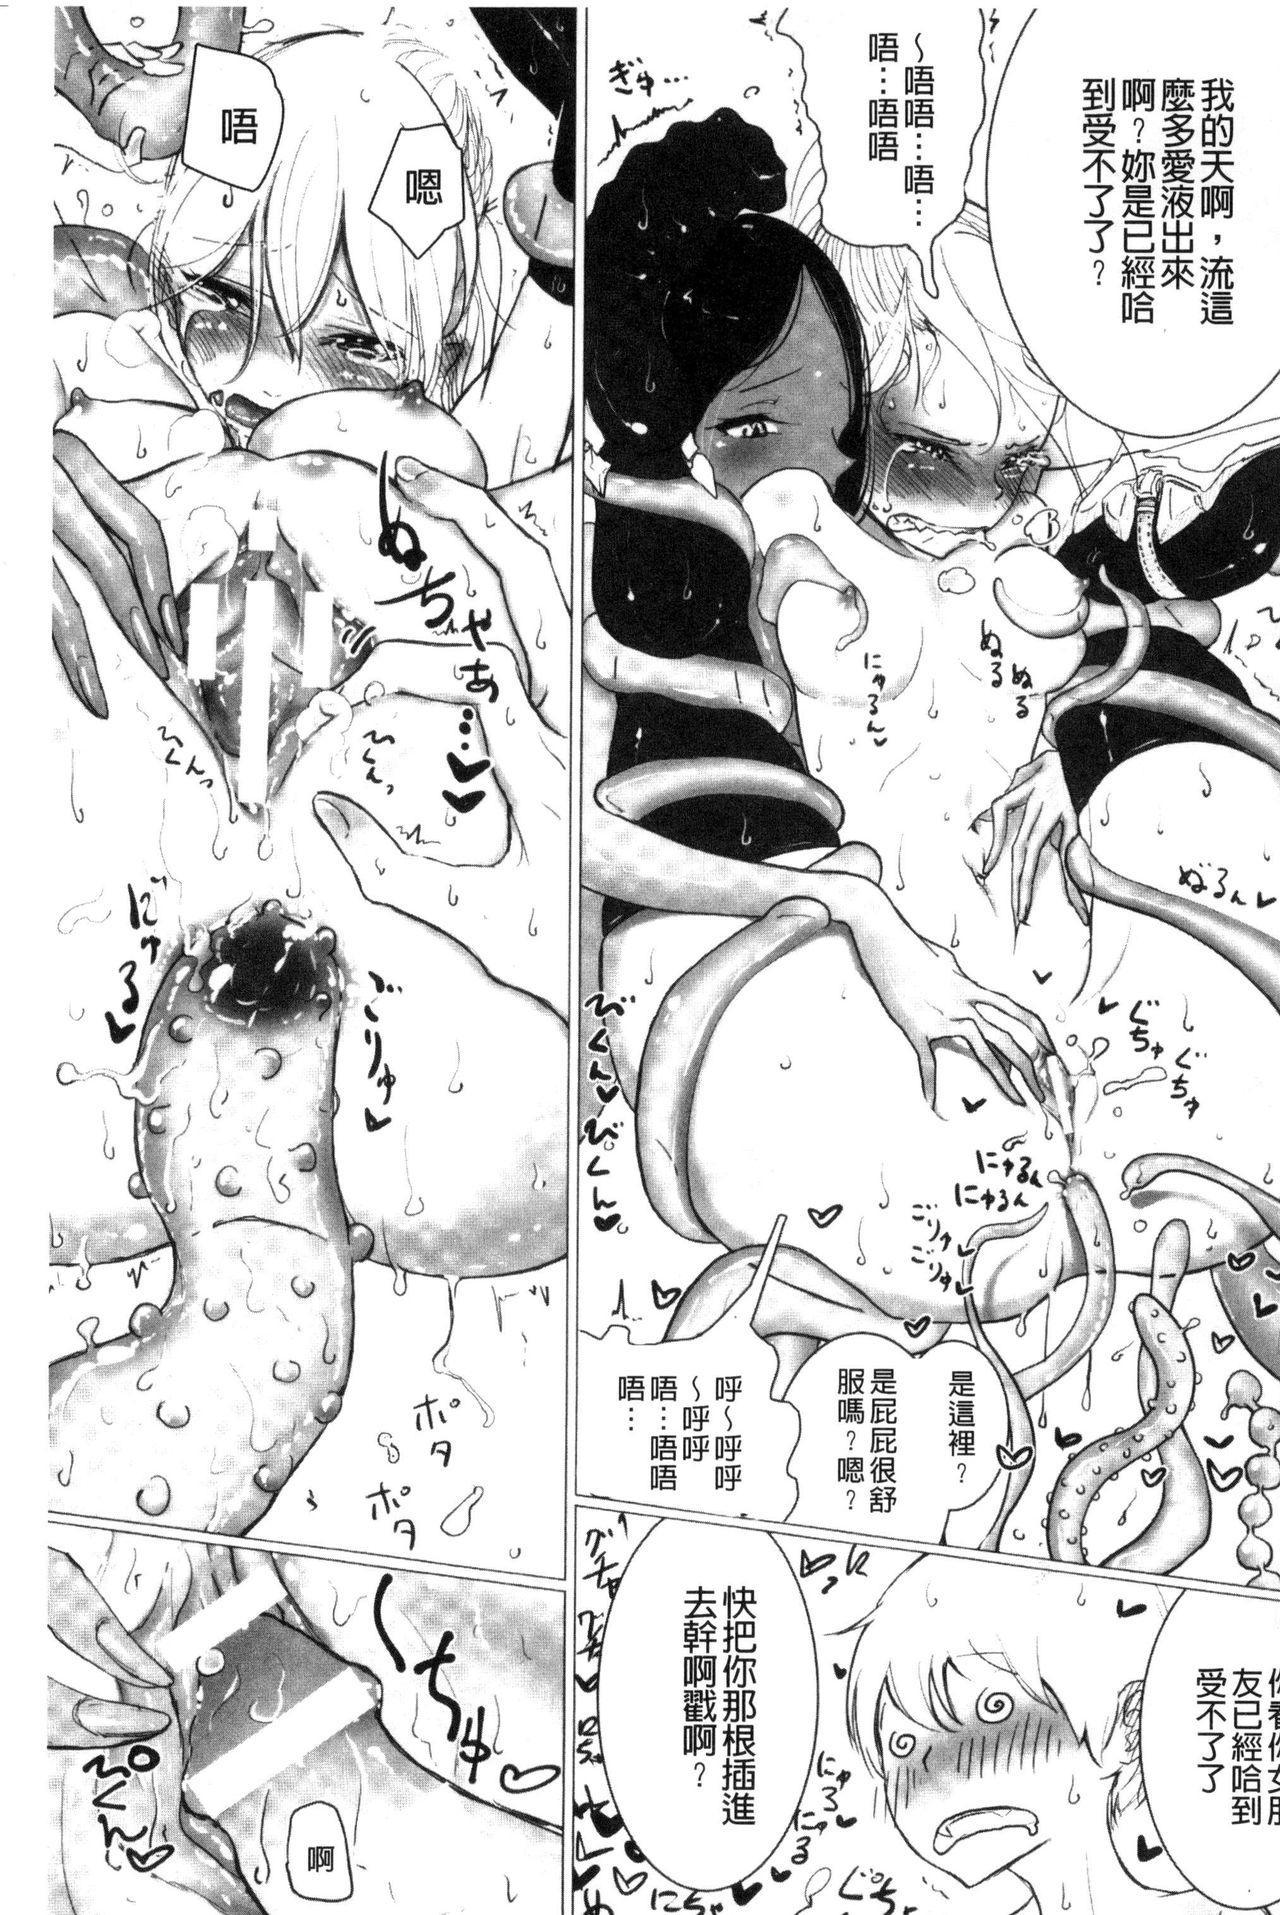 [Dhibi] Sono Yubisaki de Korogashite - Please Caress it at the Finger-tip. [Chinese] 150